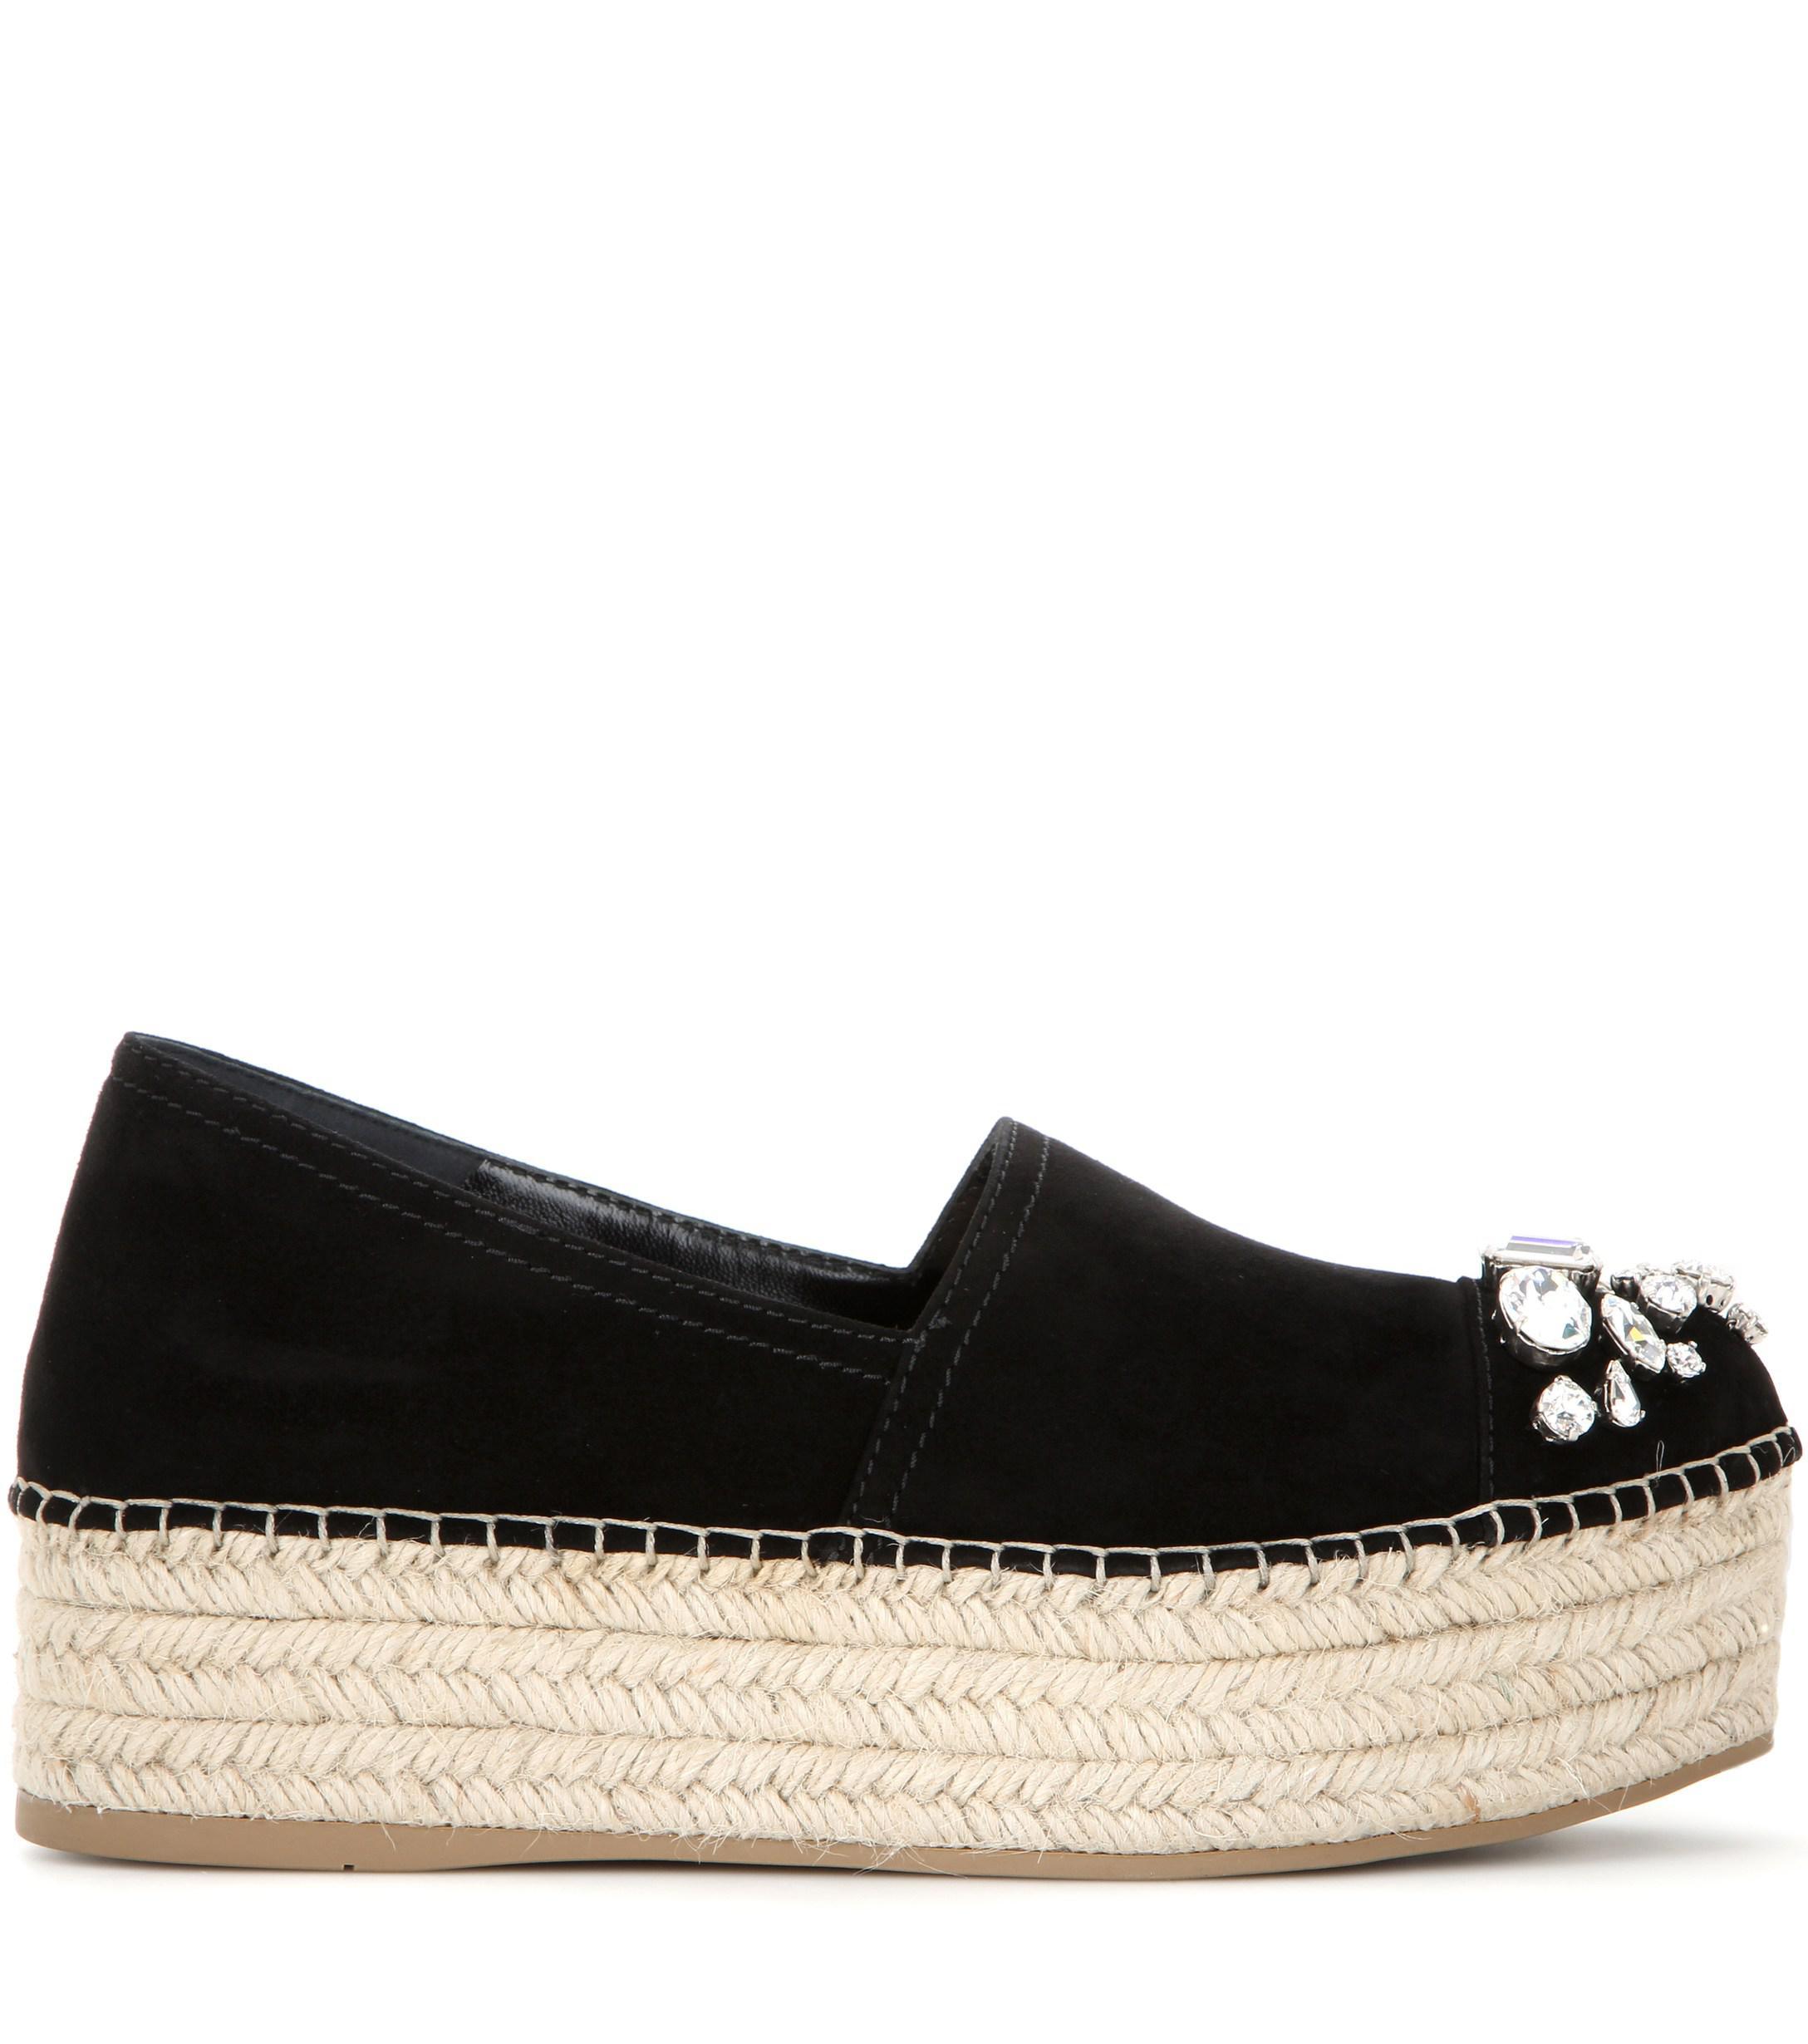 separation shoes 7c172 b0741 miu-miu-black-Embellished-Suede-Platform-Espadrilles.jpeg